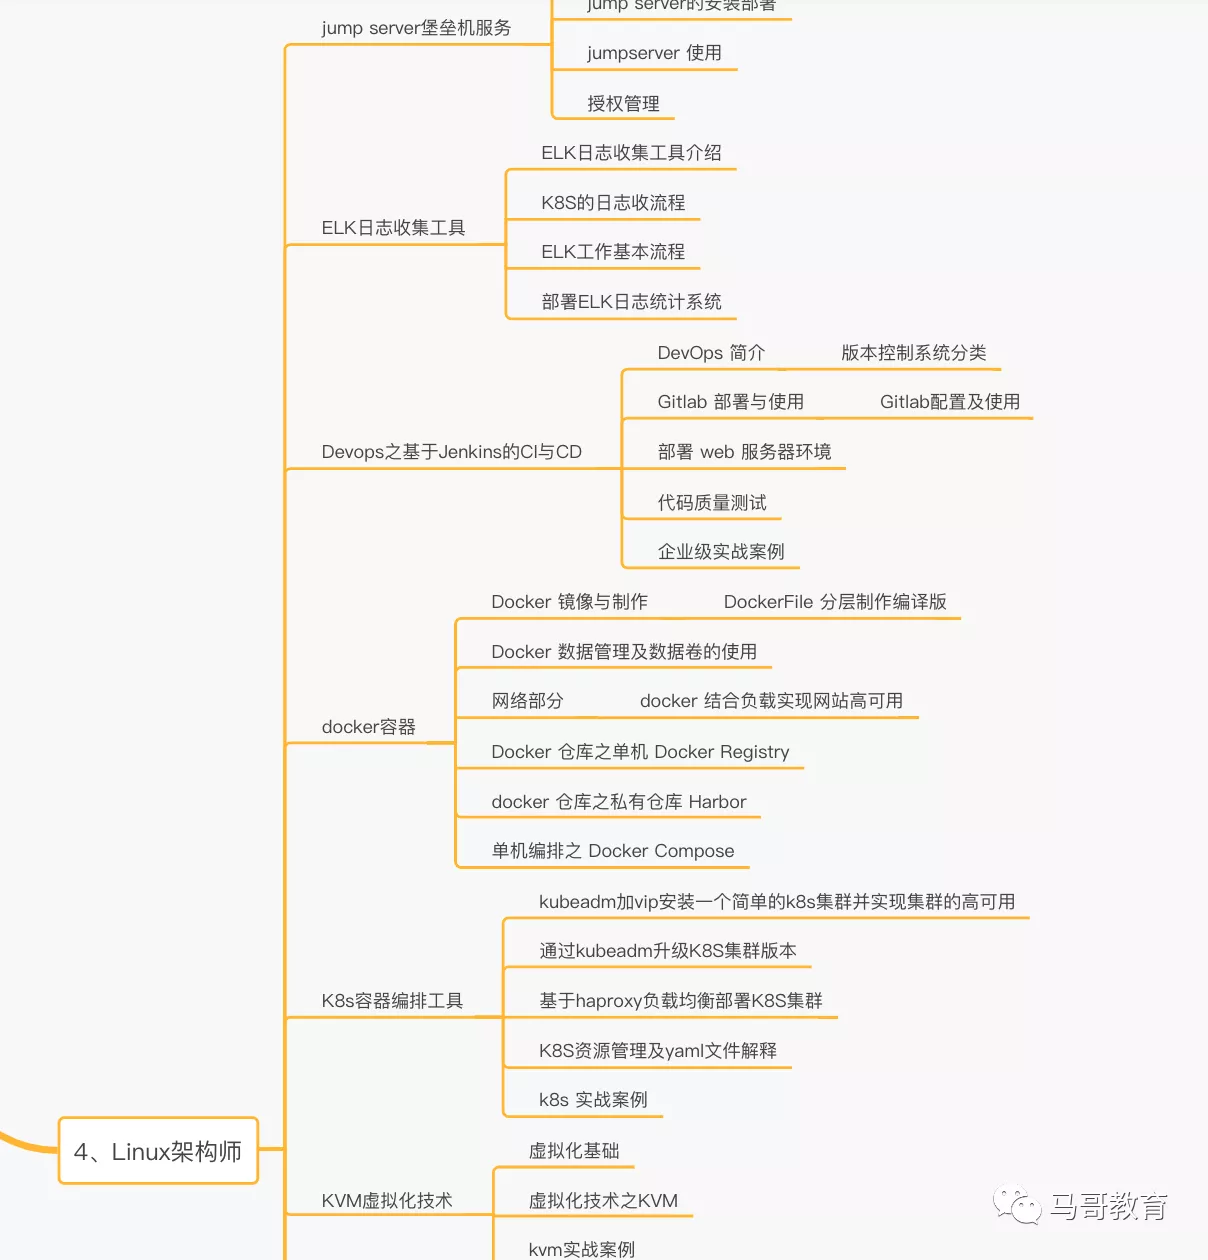 Linux学习路线图(2020年更新、内附免费学习视频)